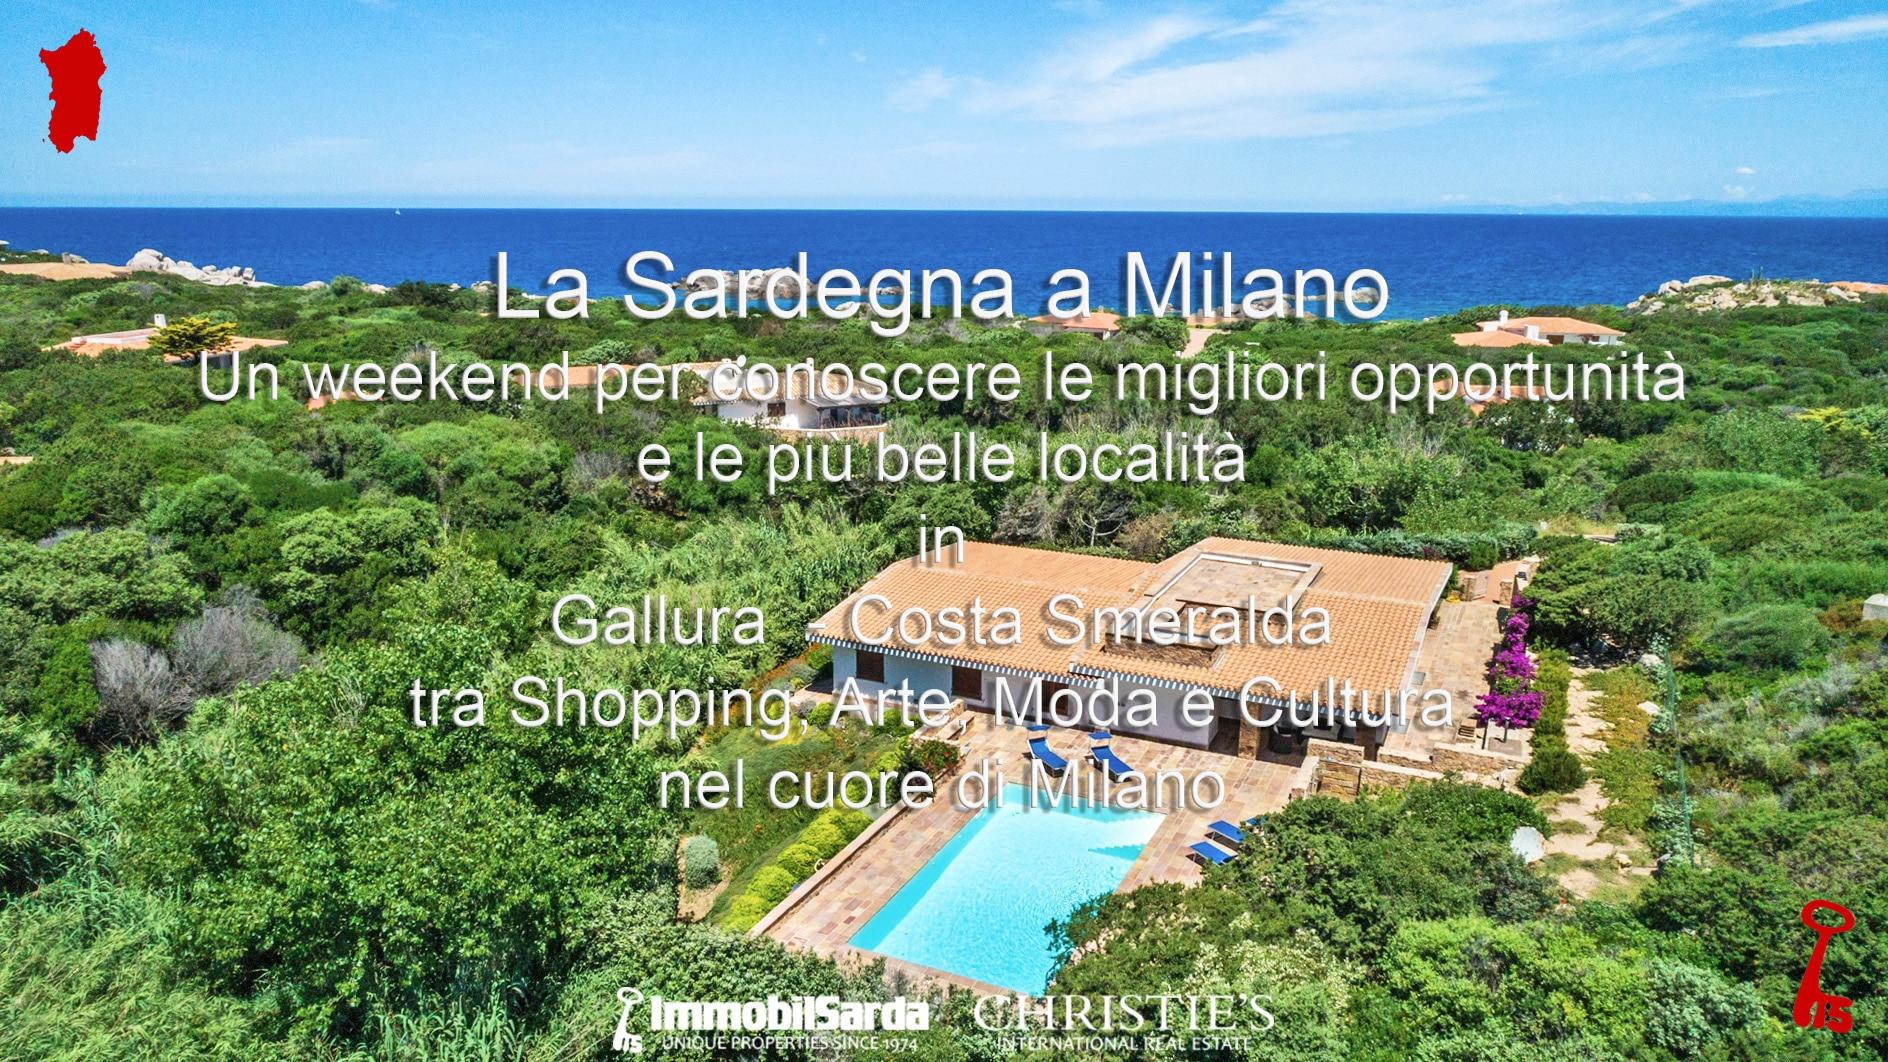 La Sardegna a Milano per Open House Weekend